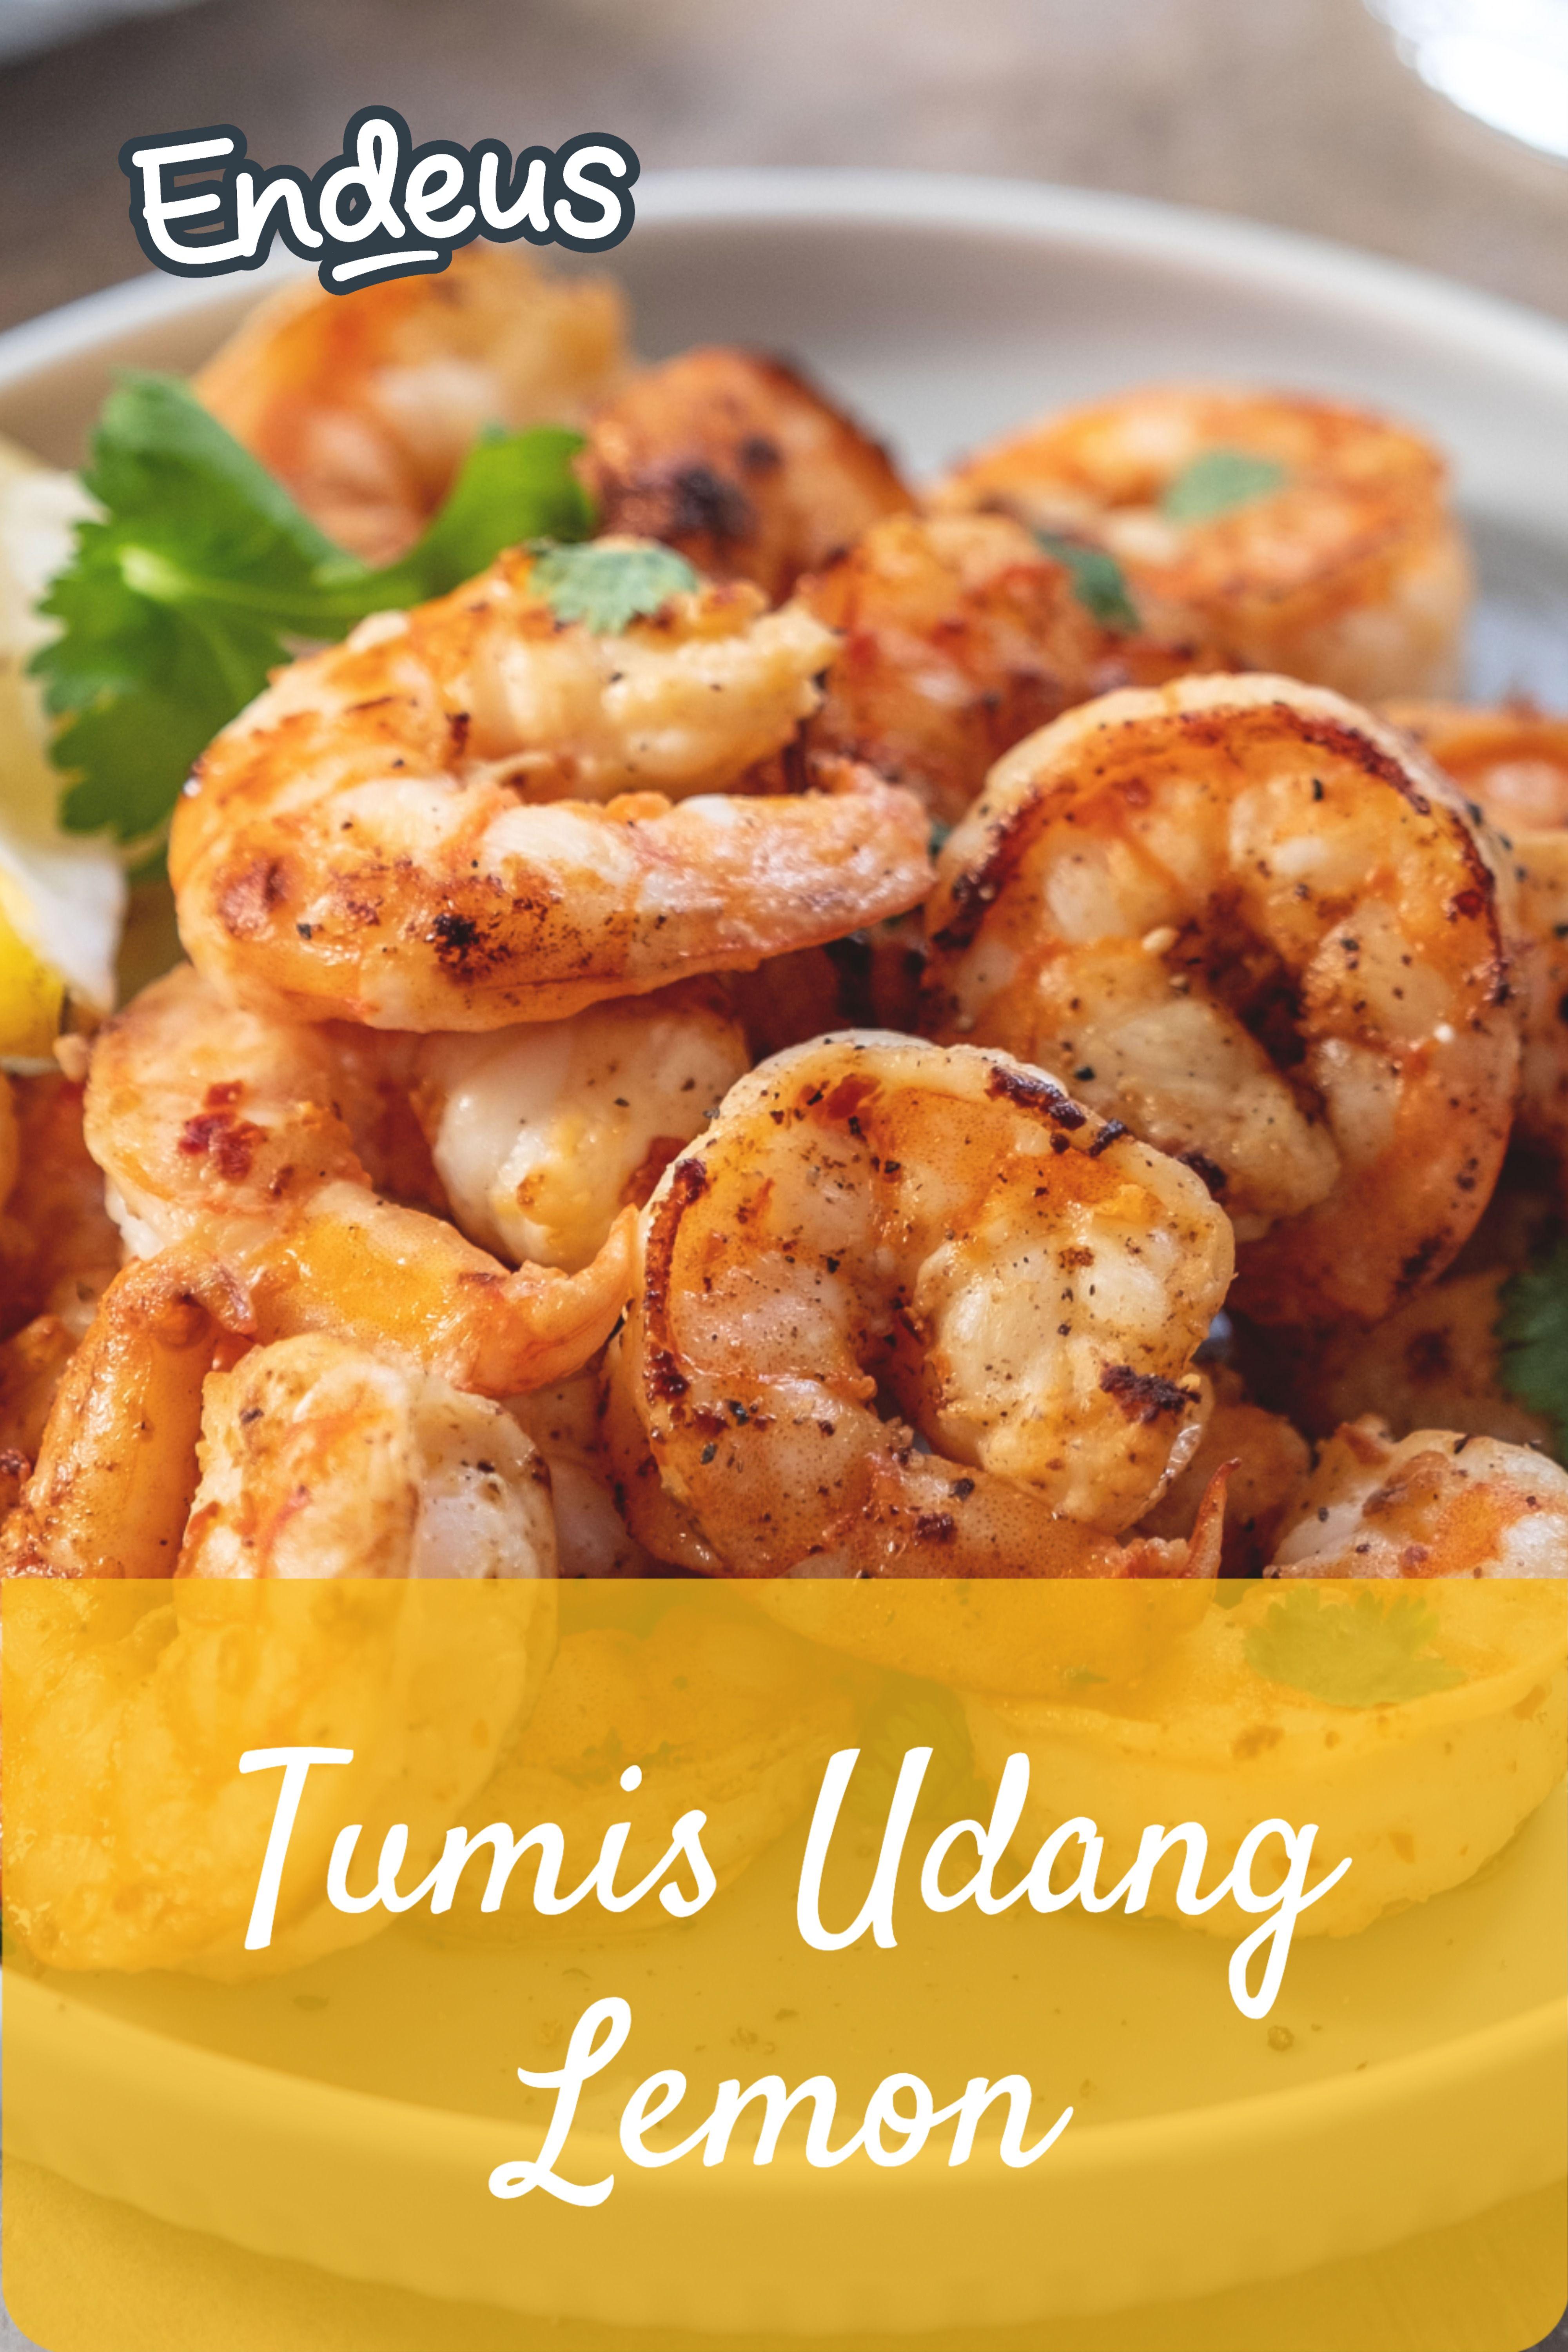 Resep Udang Tumis : resep, udang, tumis, Resep, Tumis, Udang, Lemon, Tumis,, Seafood,, Masakan